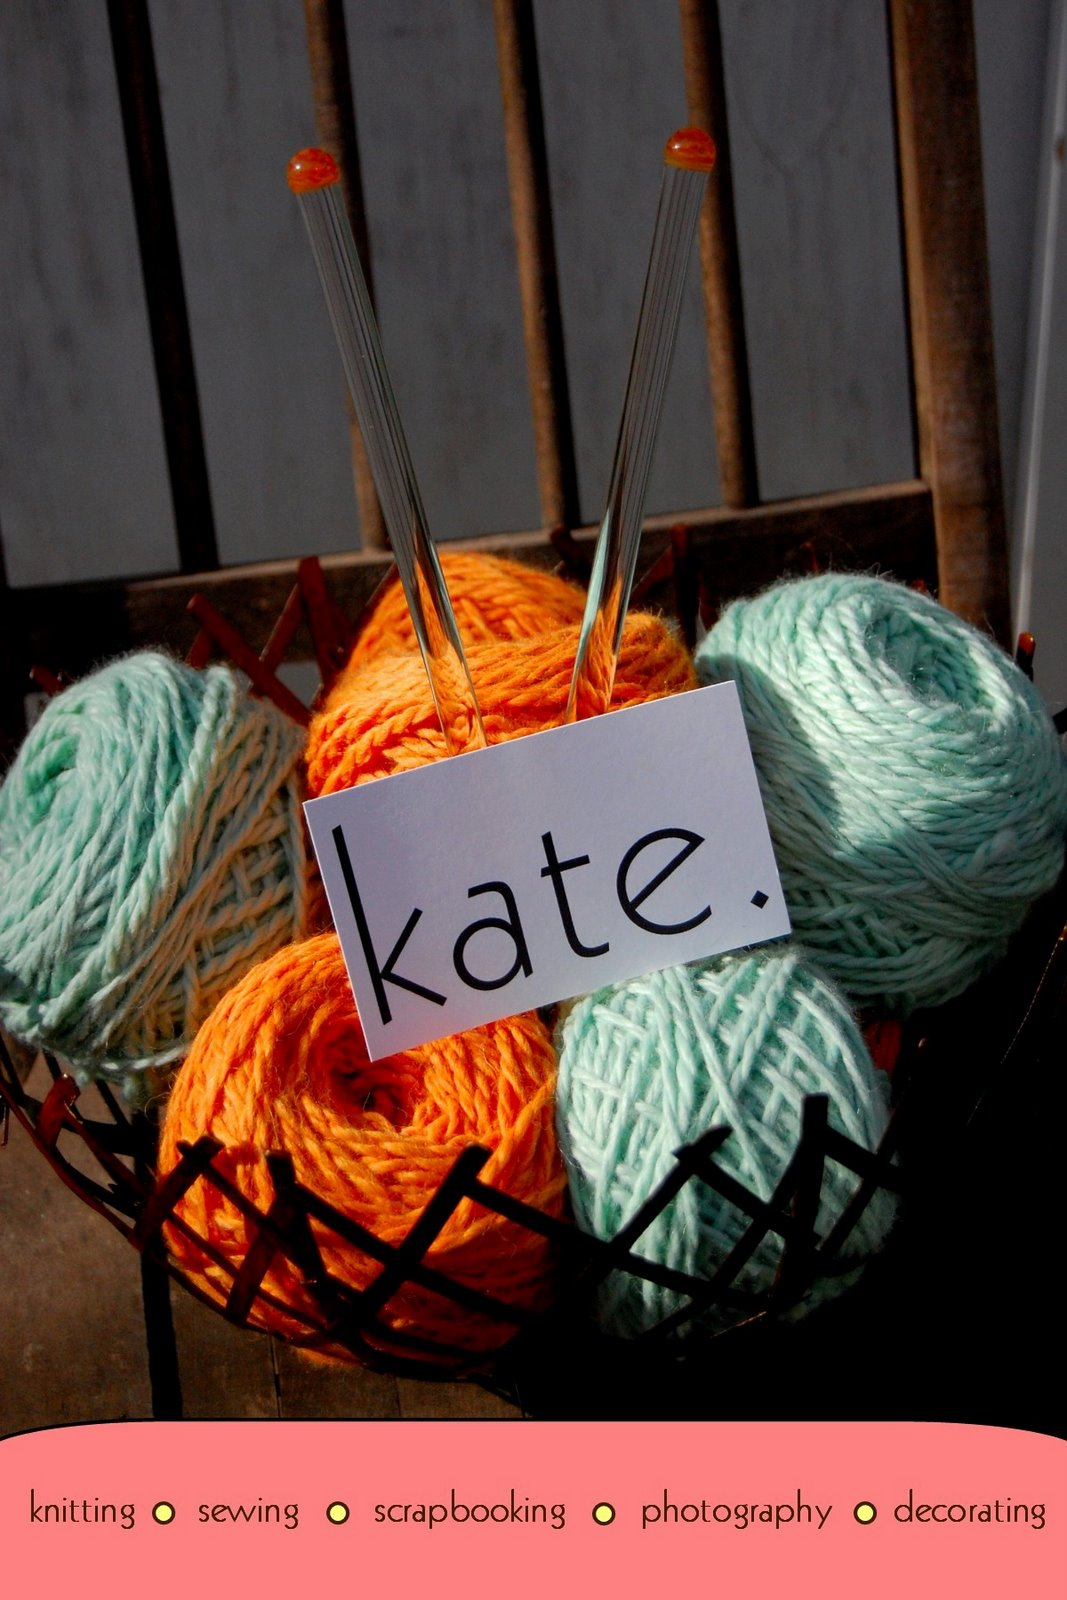 kate.designs